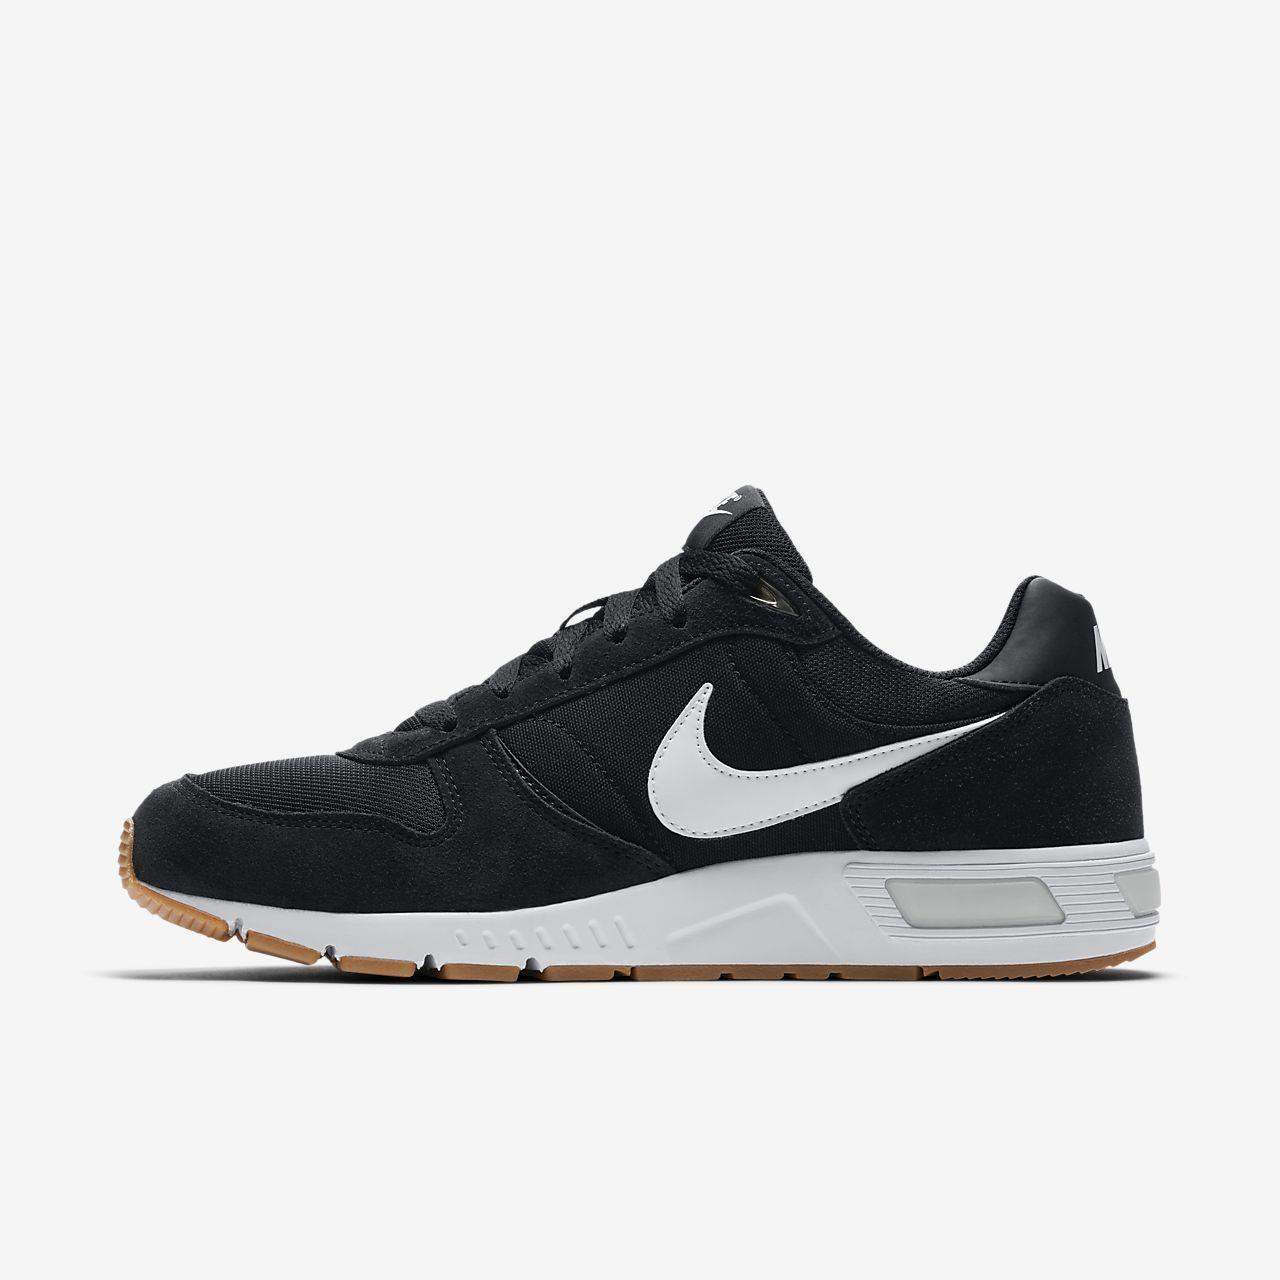 size 40 e99e5 129ee Nike Nightgazer Herrenschuh